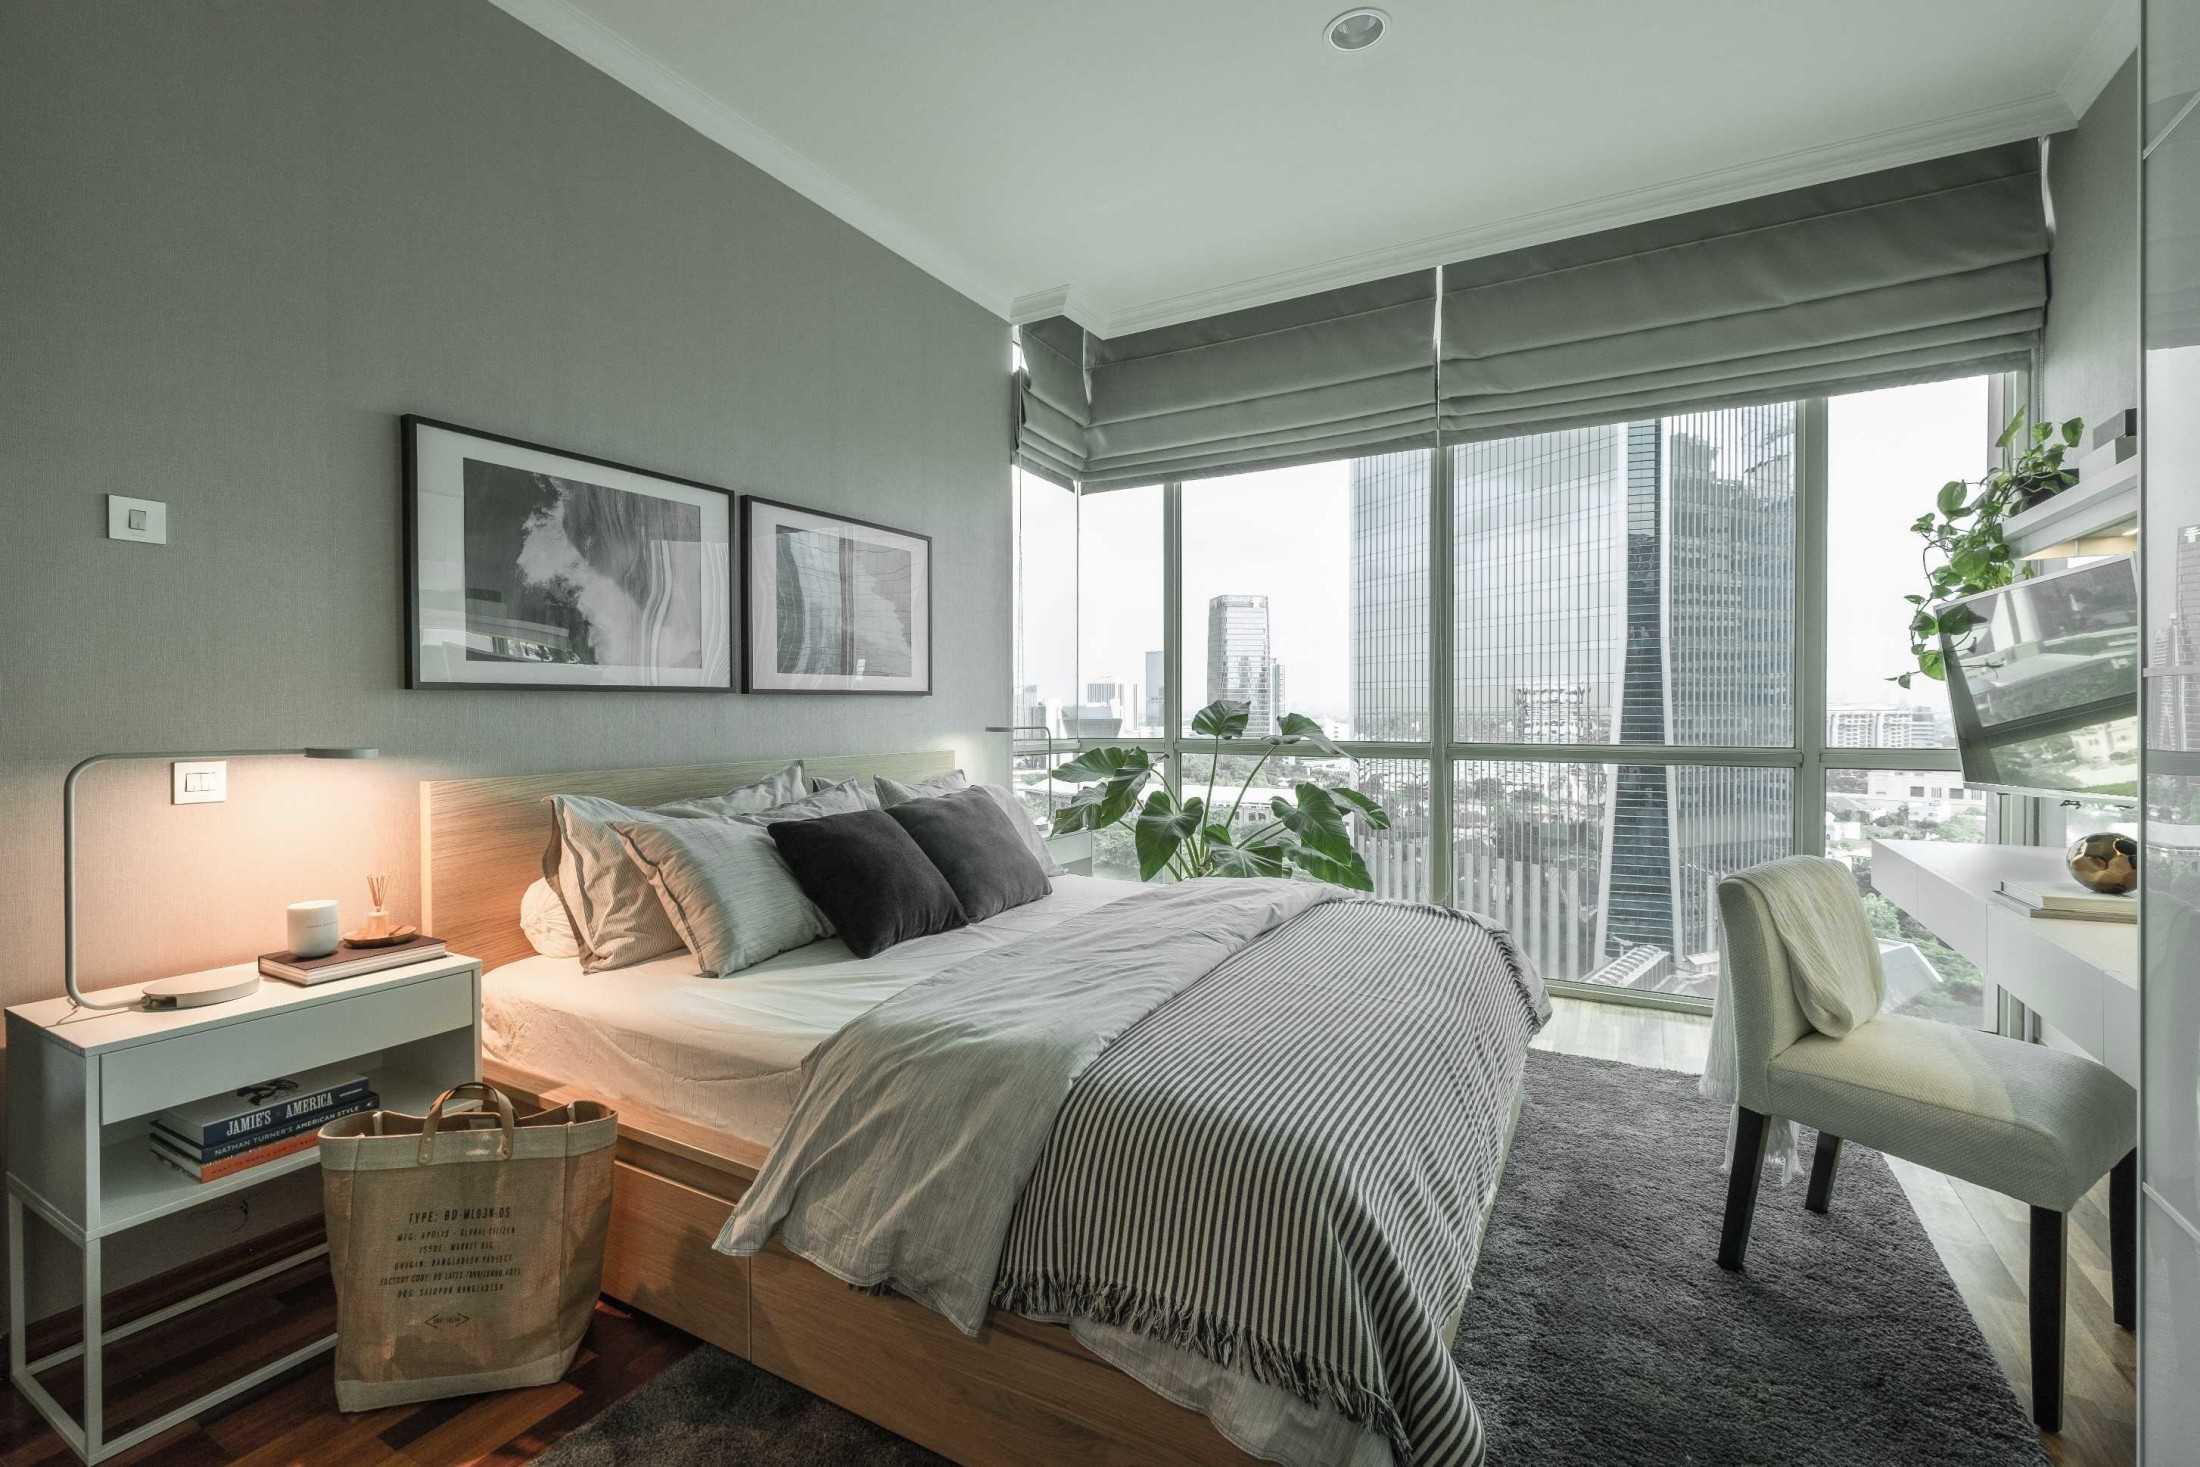 Kamar tidur BM Residence karya Makai Design Company (Sumber: arsitag.com)